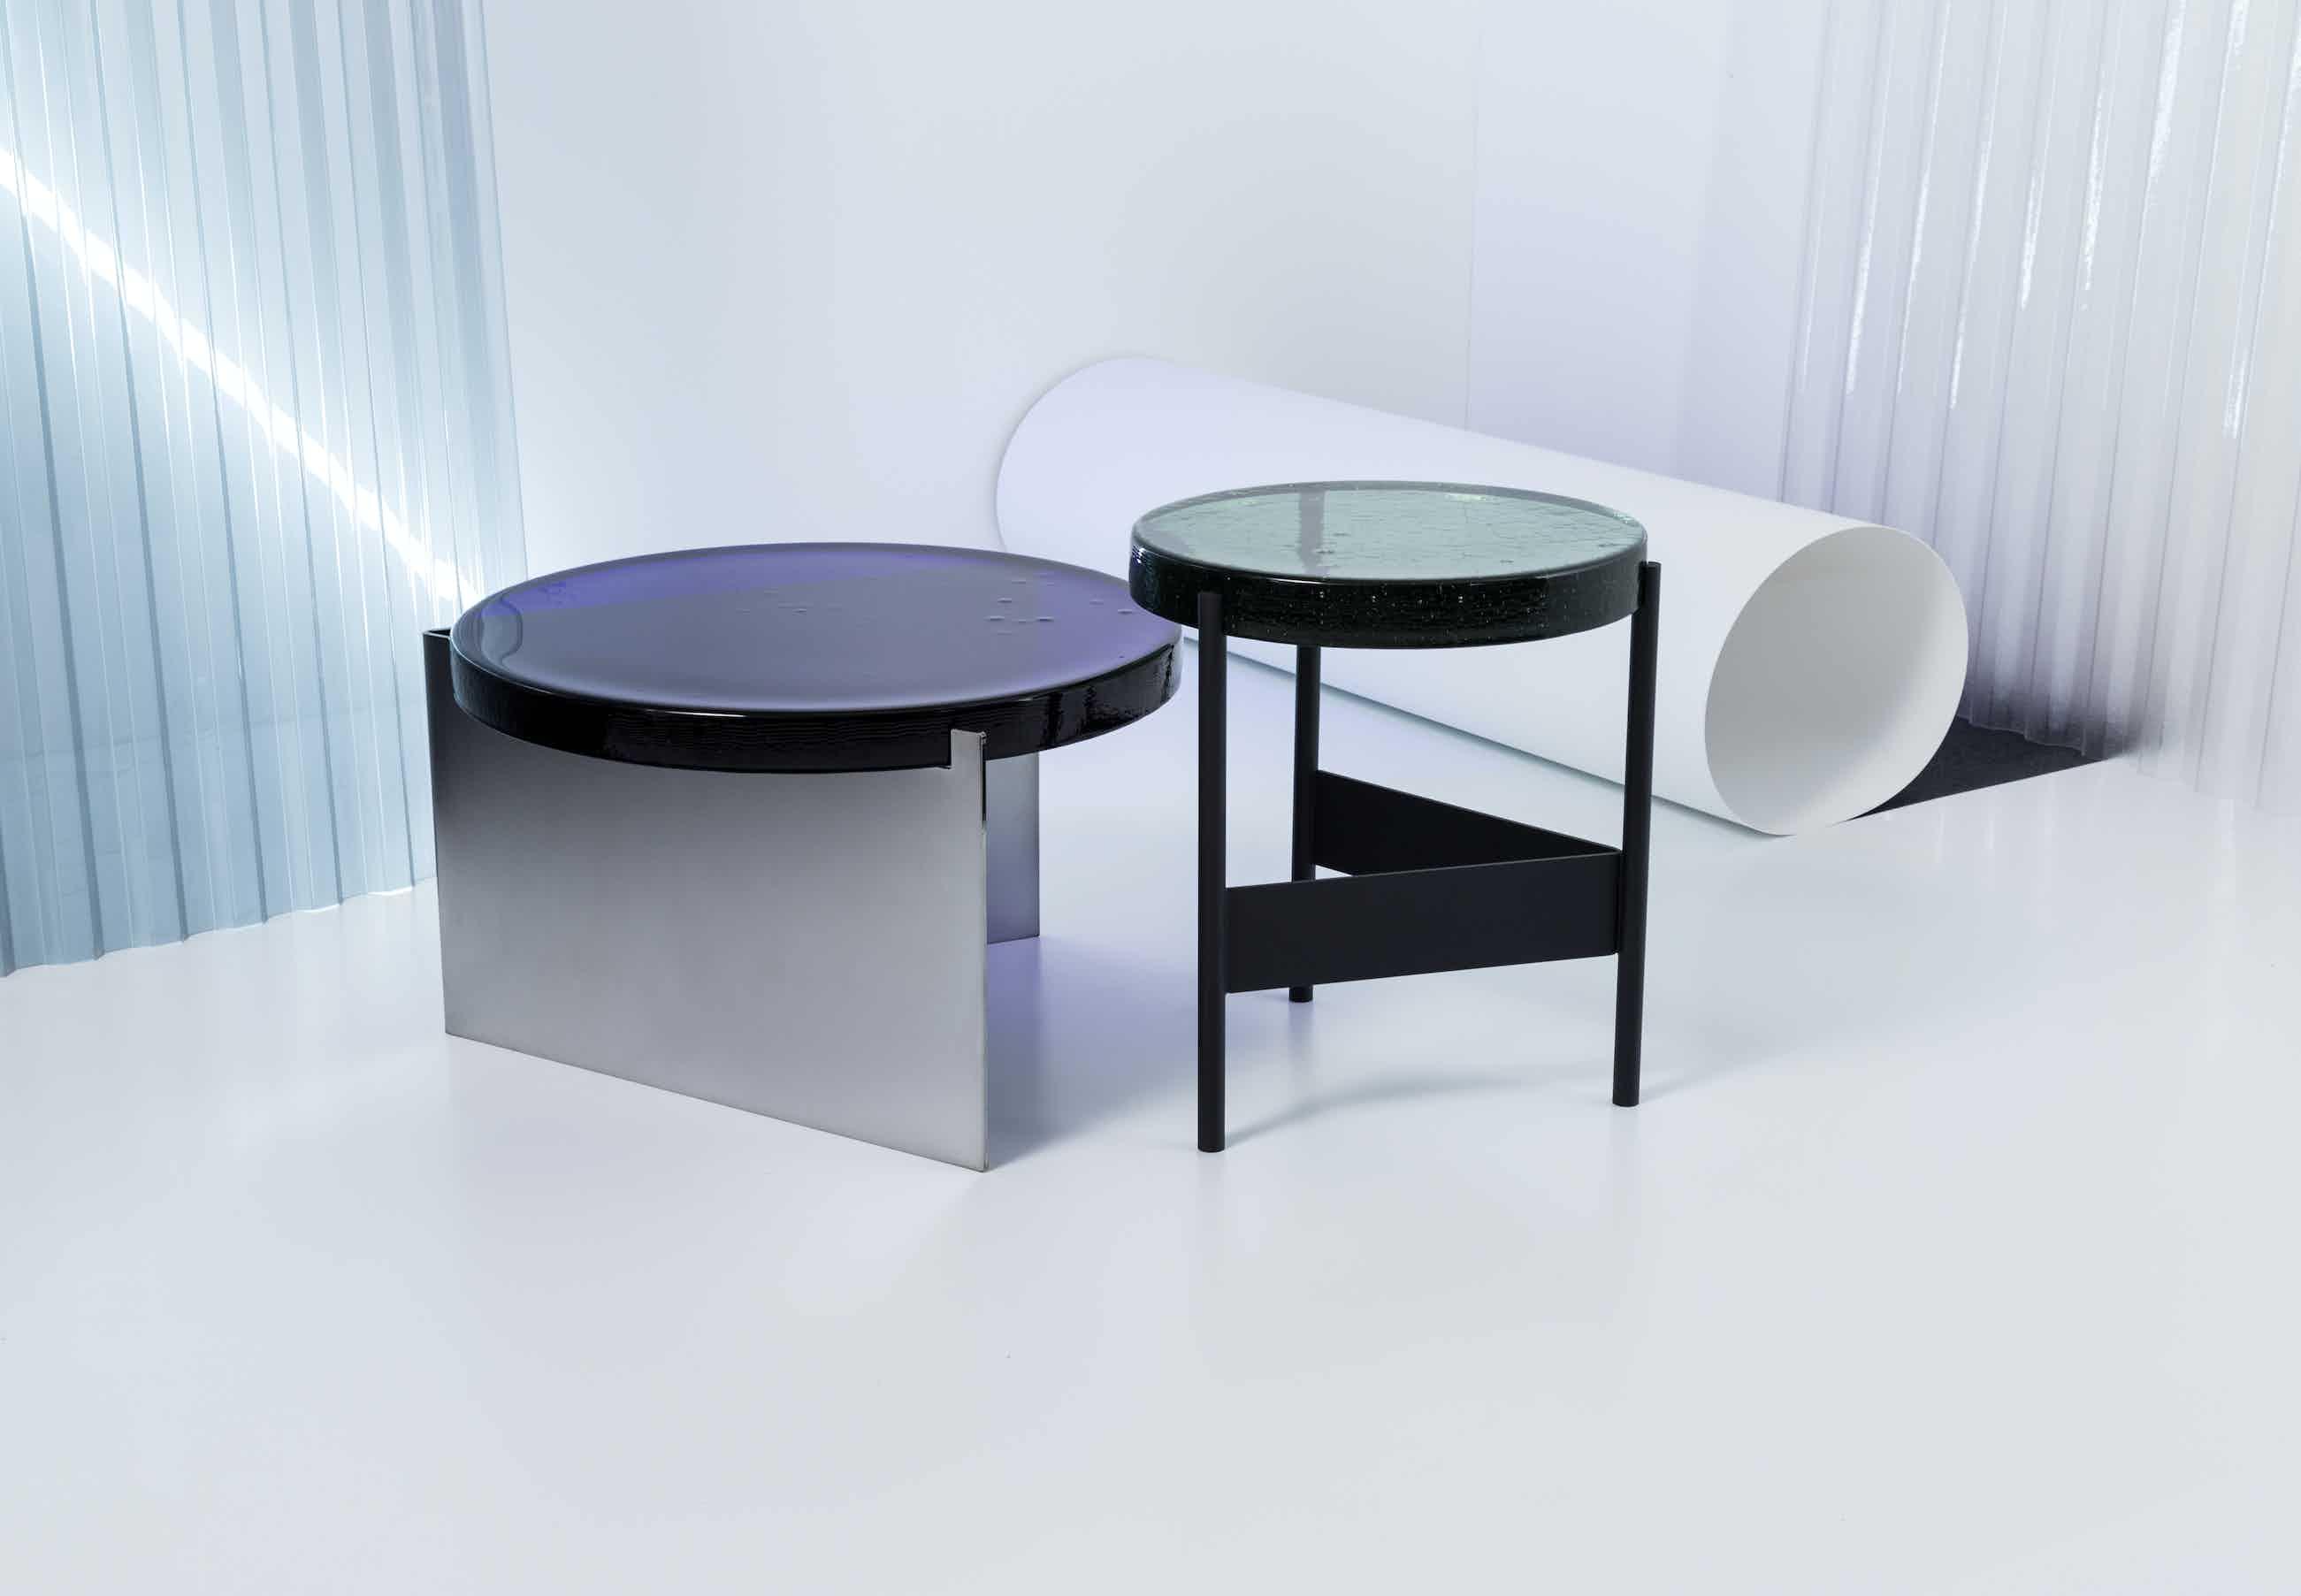 Pulpo alwa one table insitu haute living